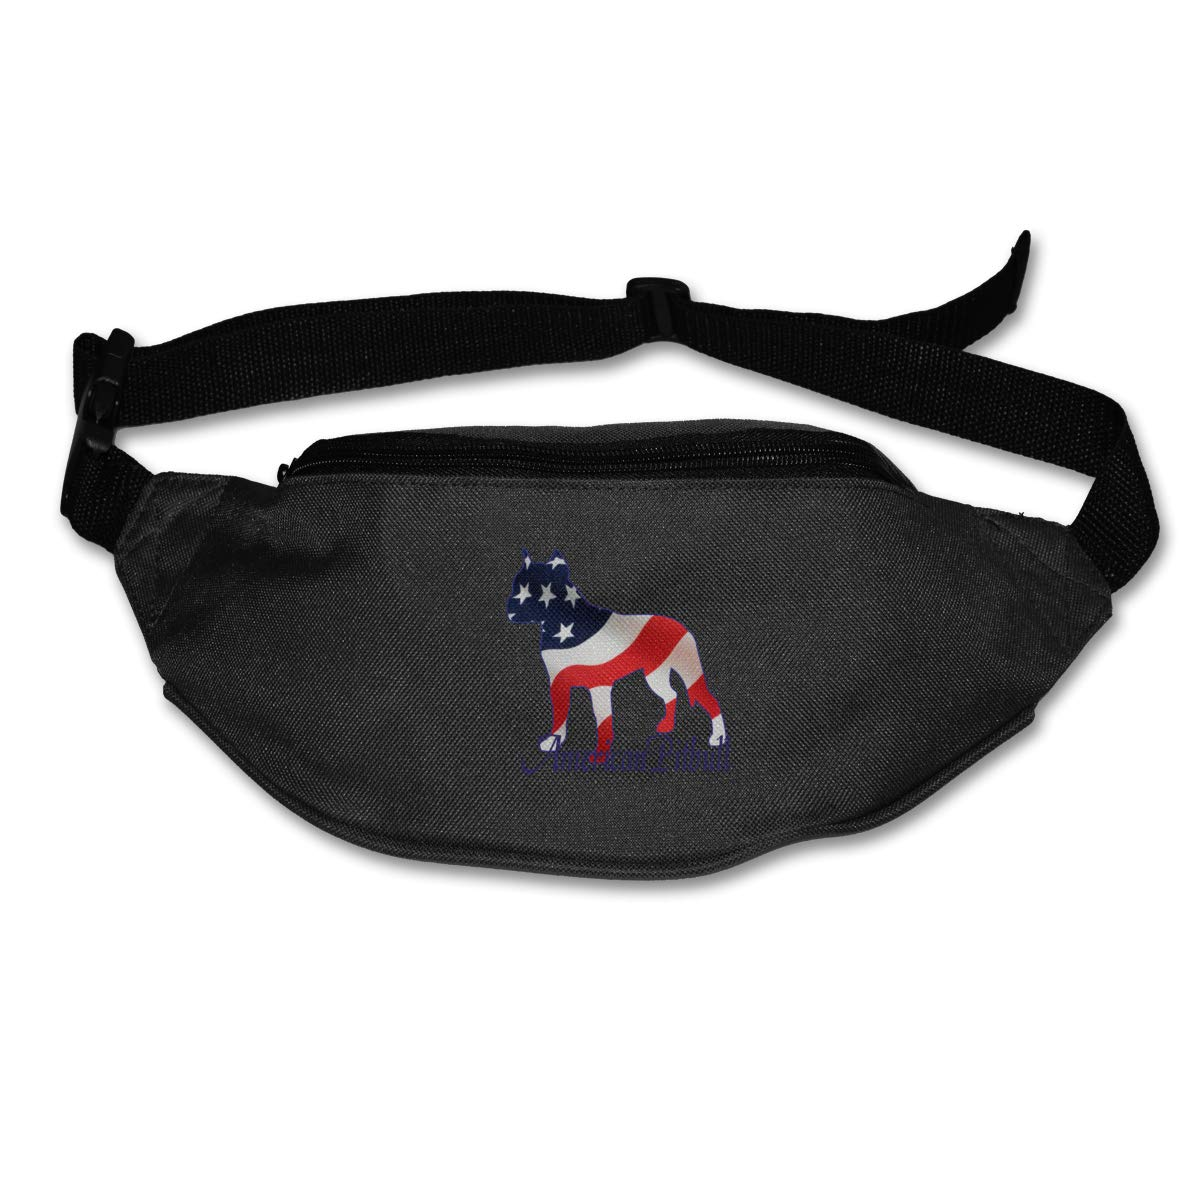 American Love Pitbull Sport Waist Bag Fanny Pack Adjustable For Run